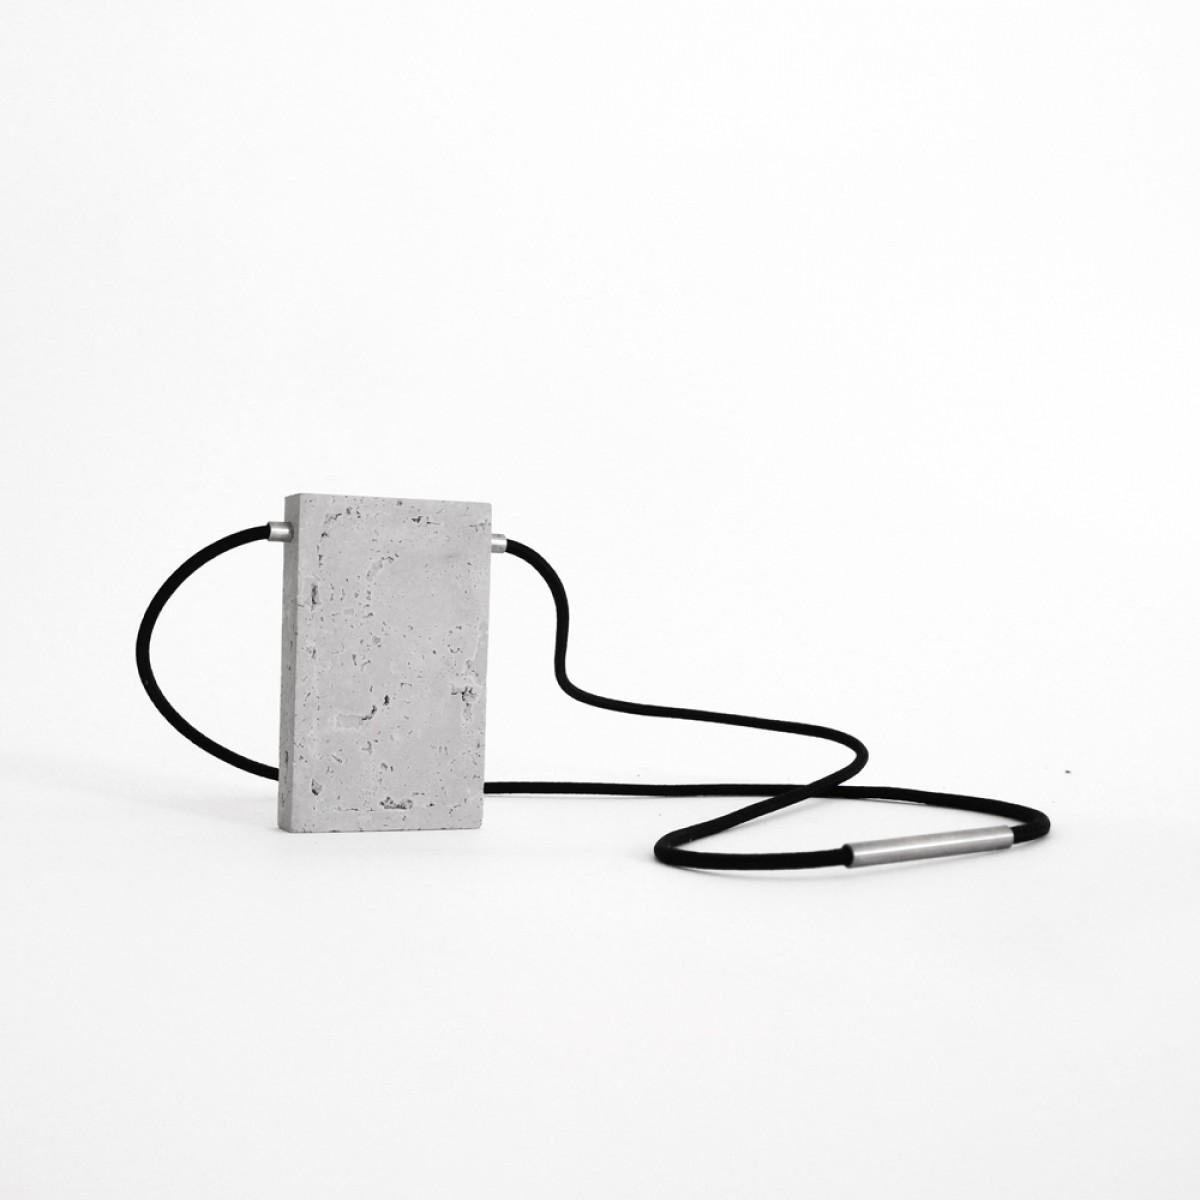 Concrete Necklace GRT01 by ORTOGONALE